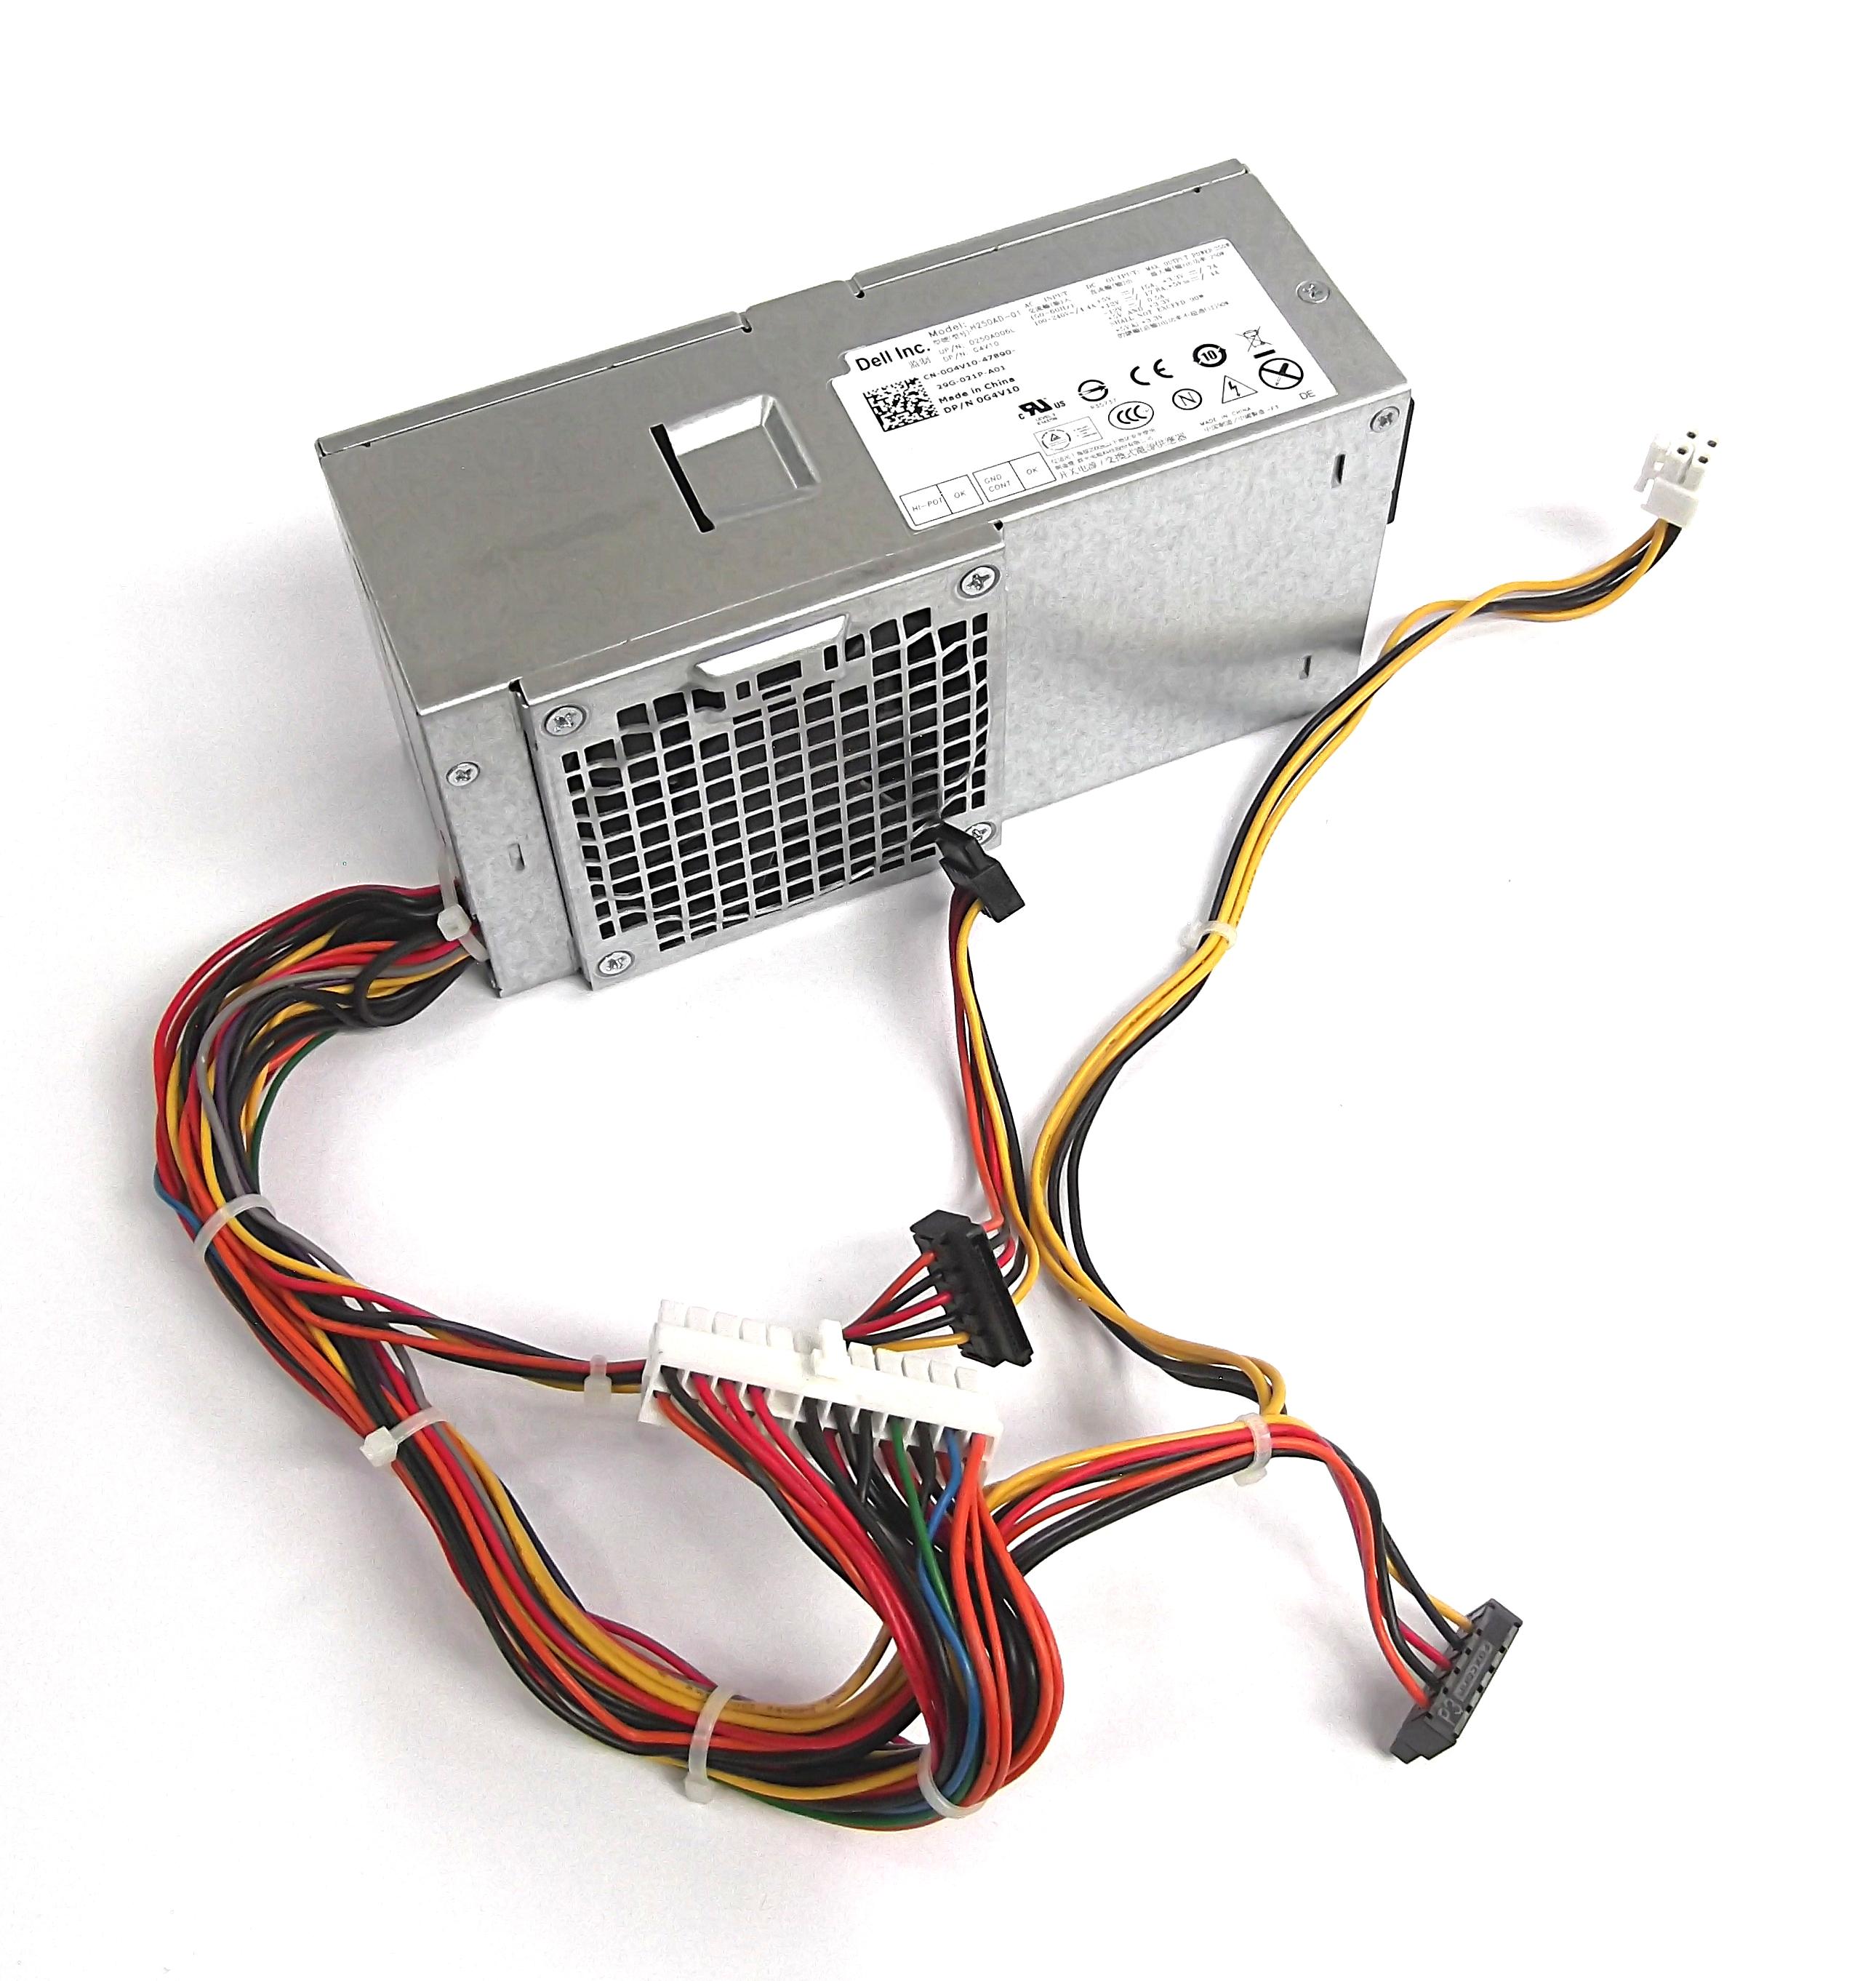 Dell G4V10 Optiplex 3010/7010 SFF 250W Power Supply - H250AD-01